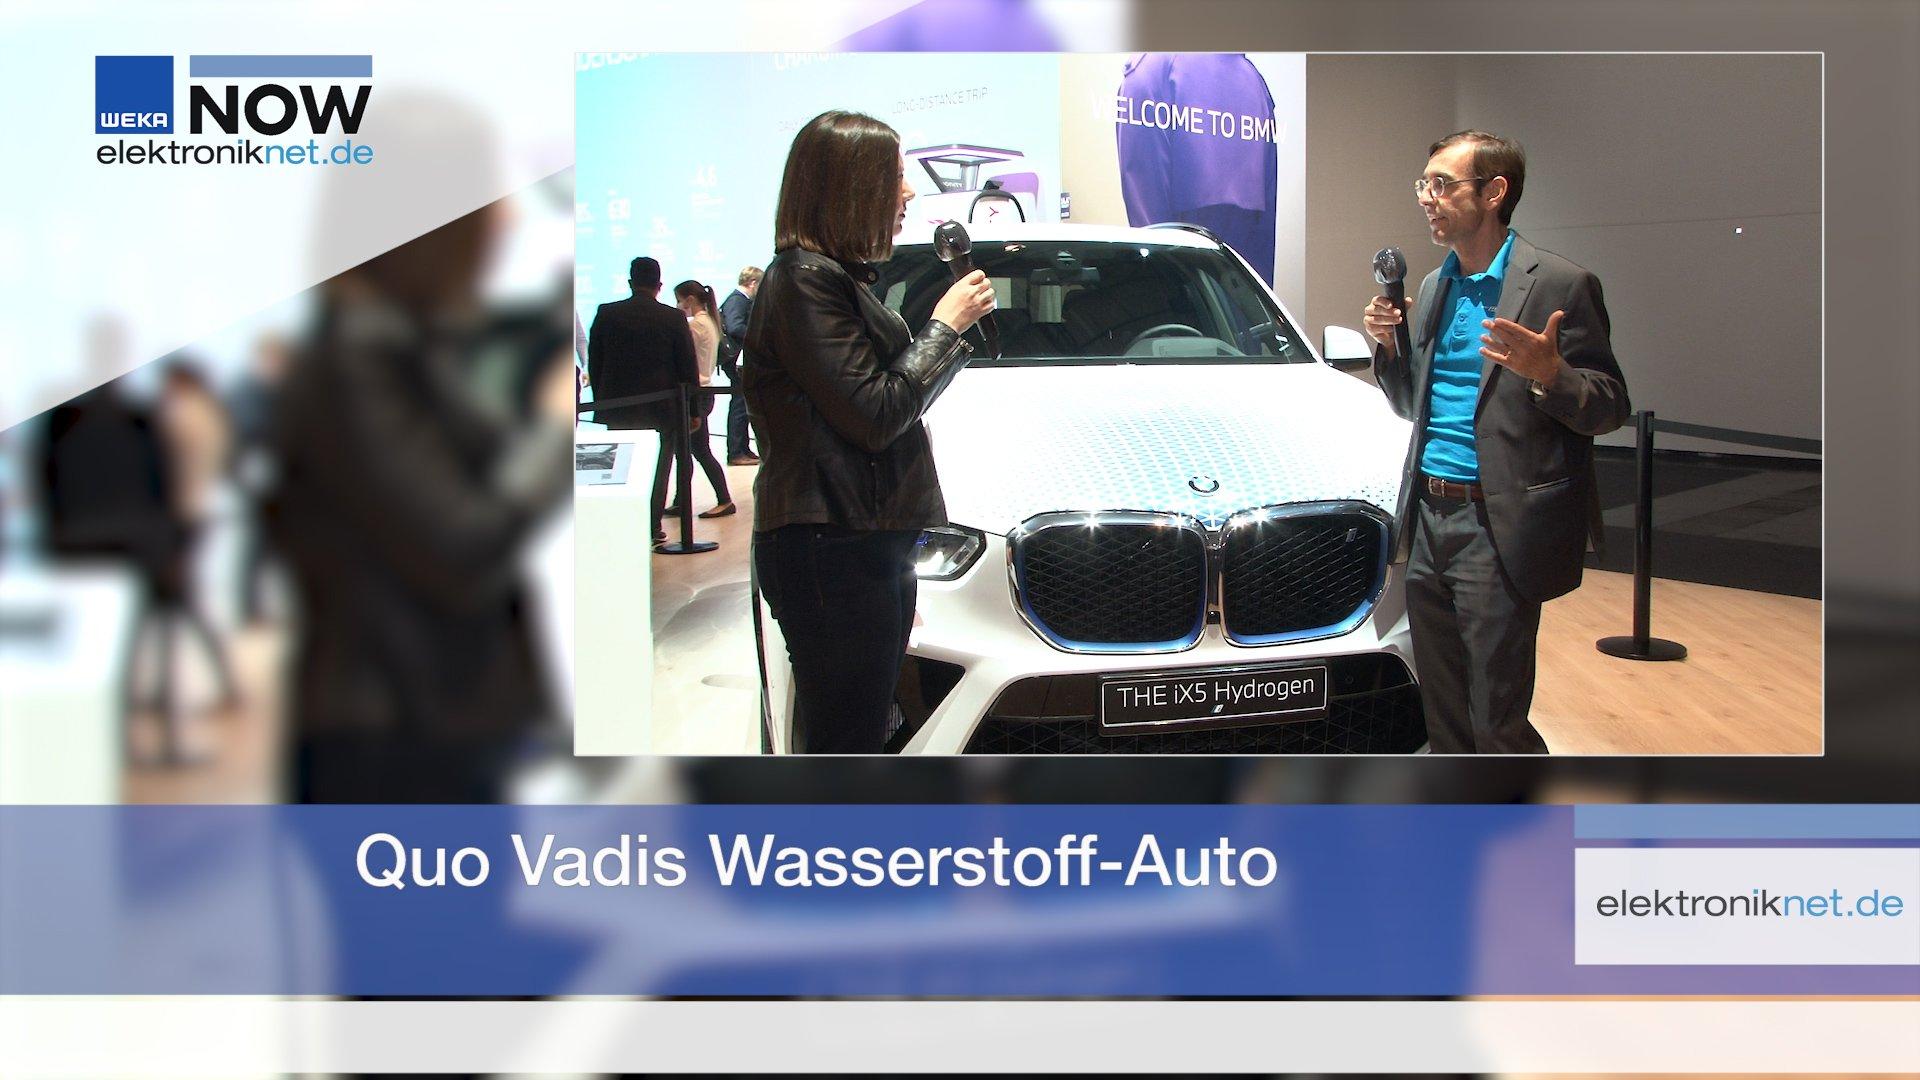 Quo Vadis Wasserstoff-Auto